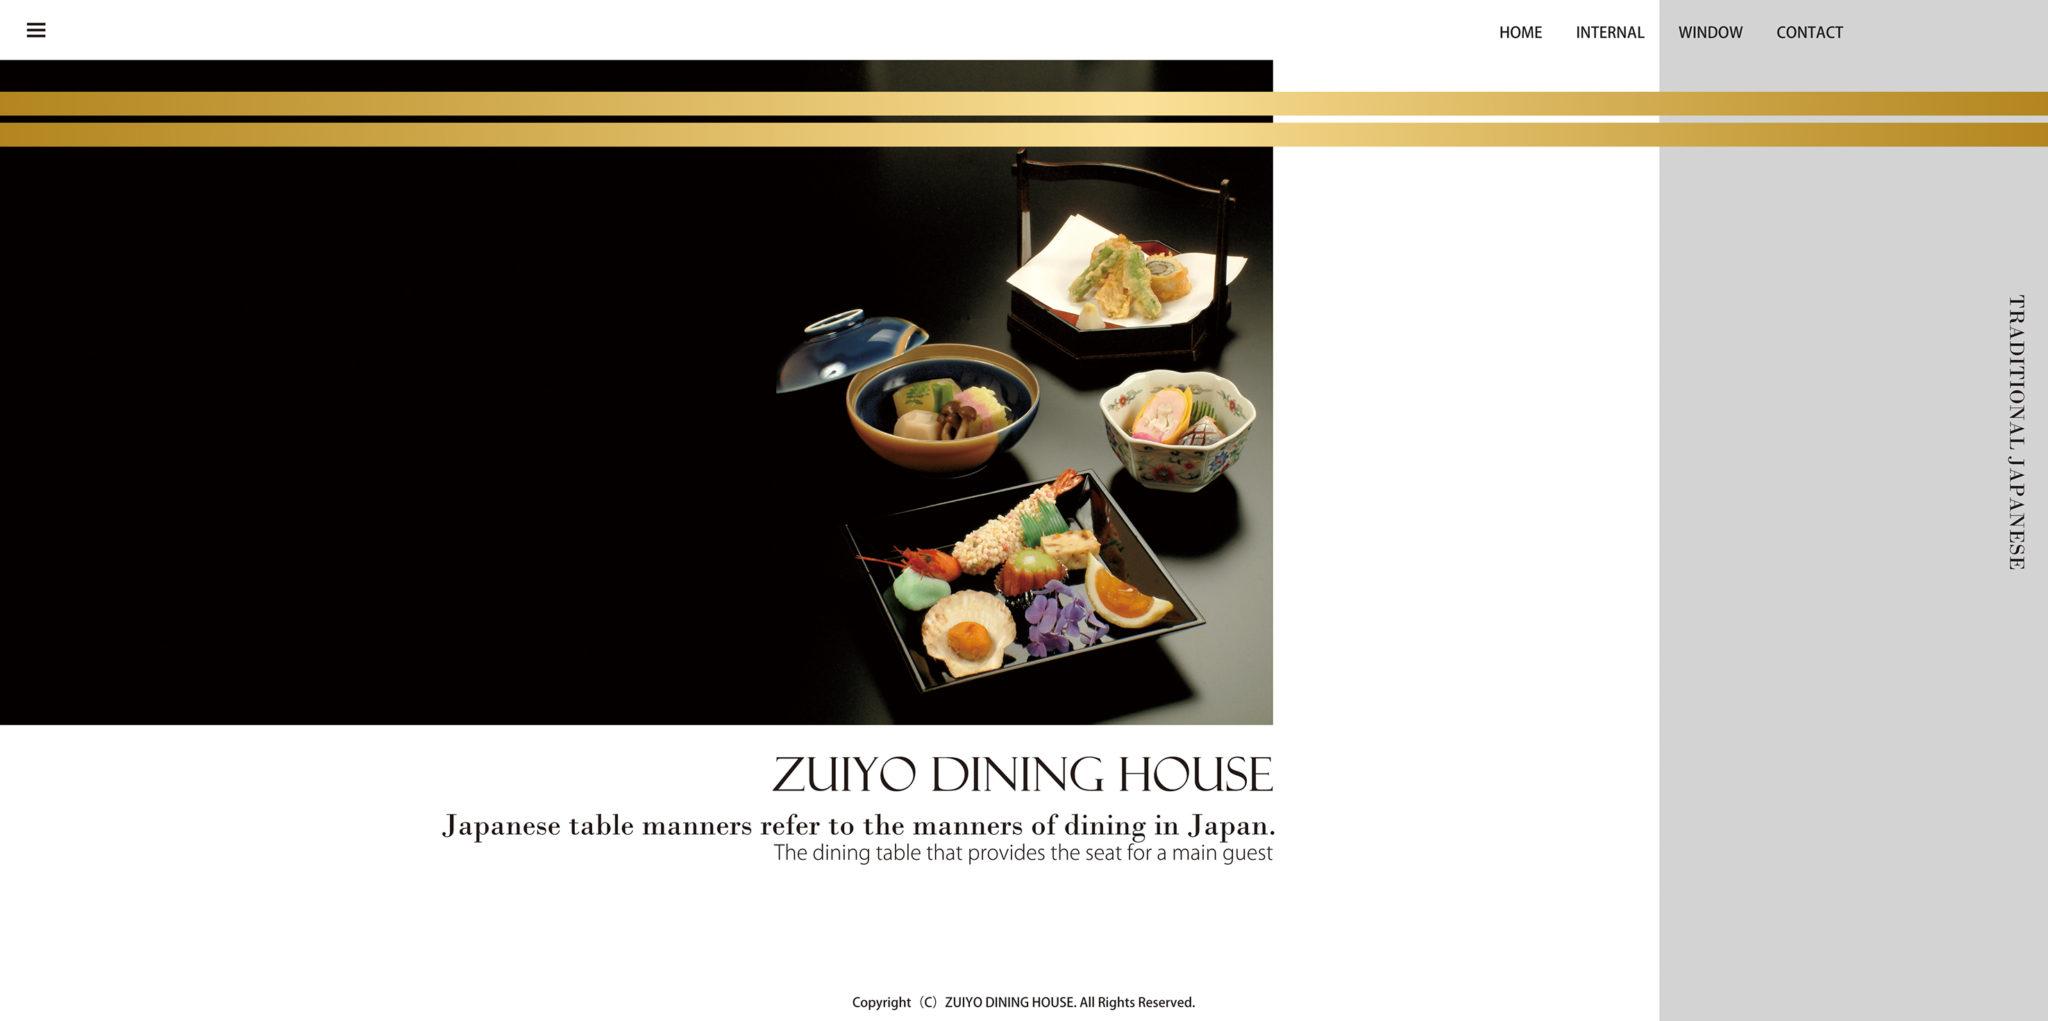 30_ZUIYO dining HOUSE